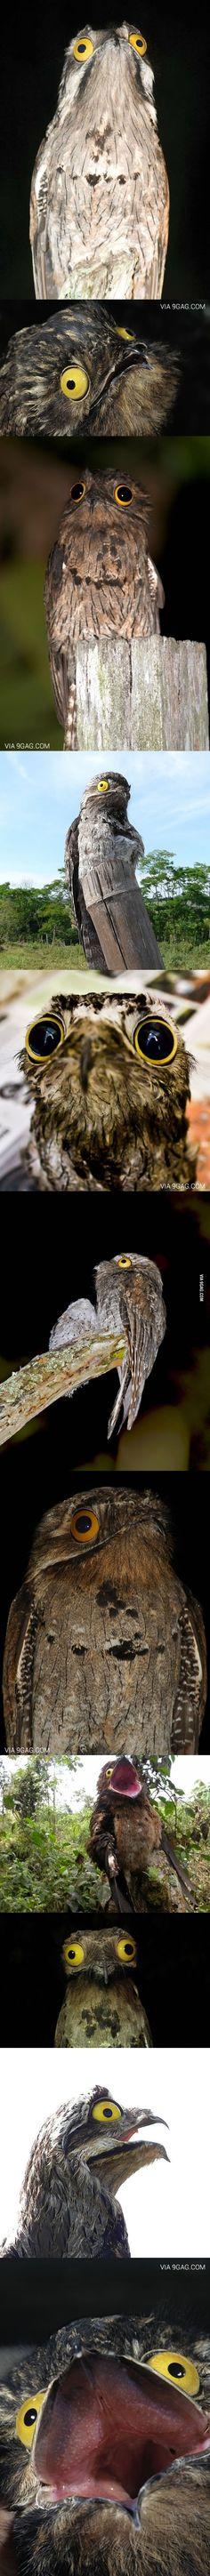 The Potoo Bird Always Looks Like It Saw Something Horrifying  Do you have any of these?!?! @Mada